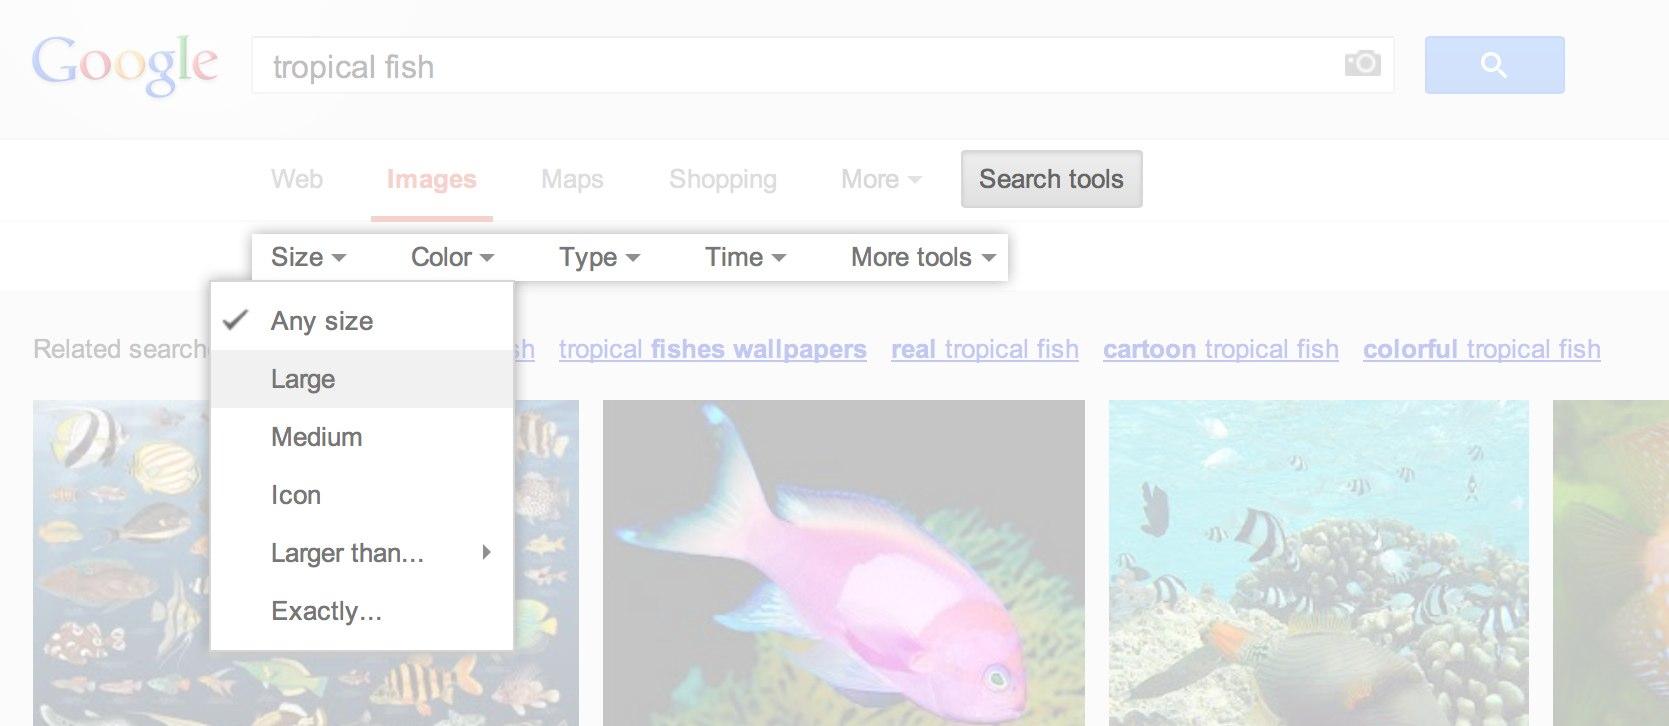 search_tools.jpg